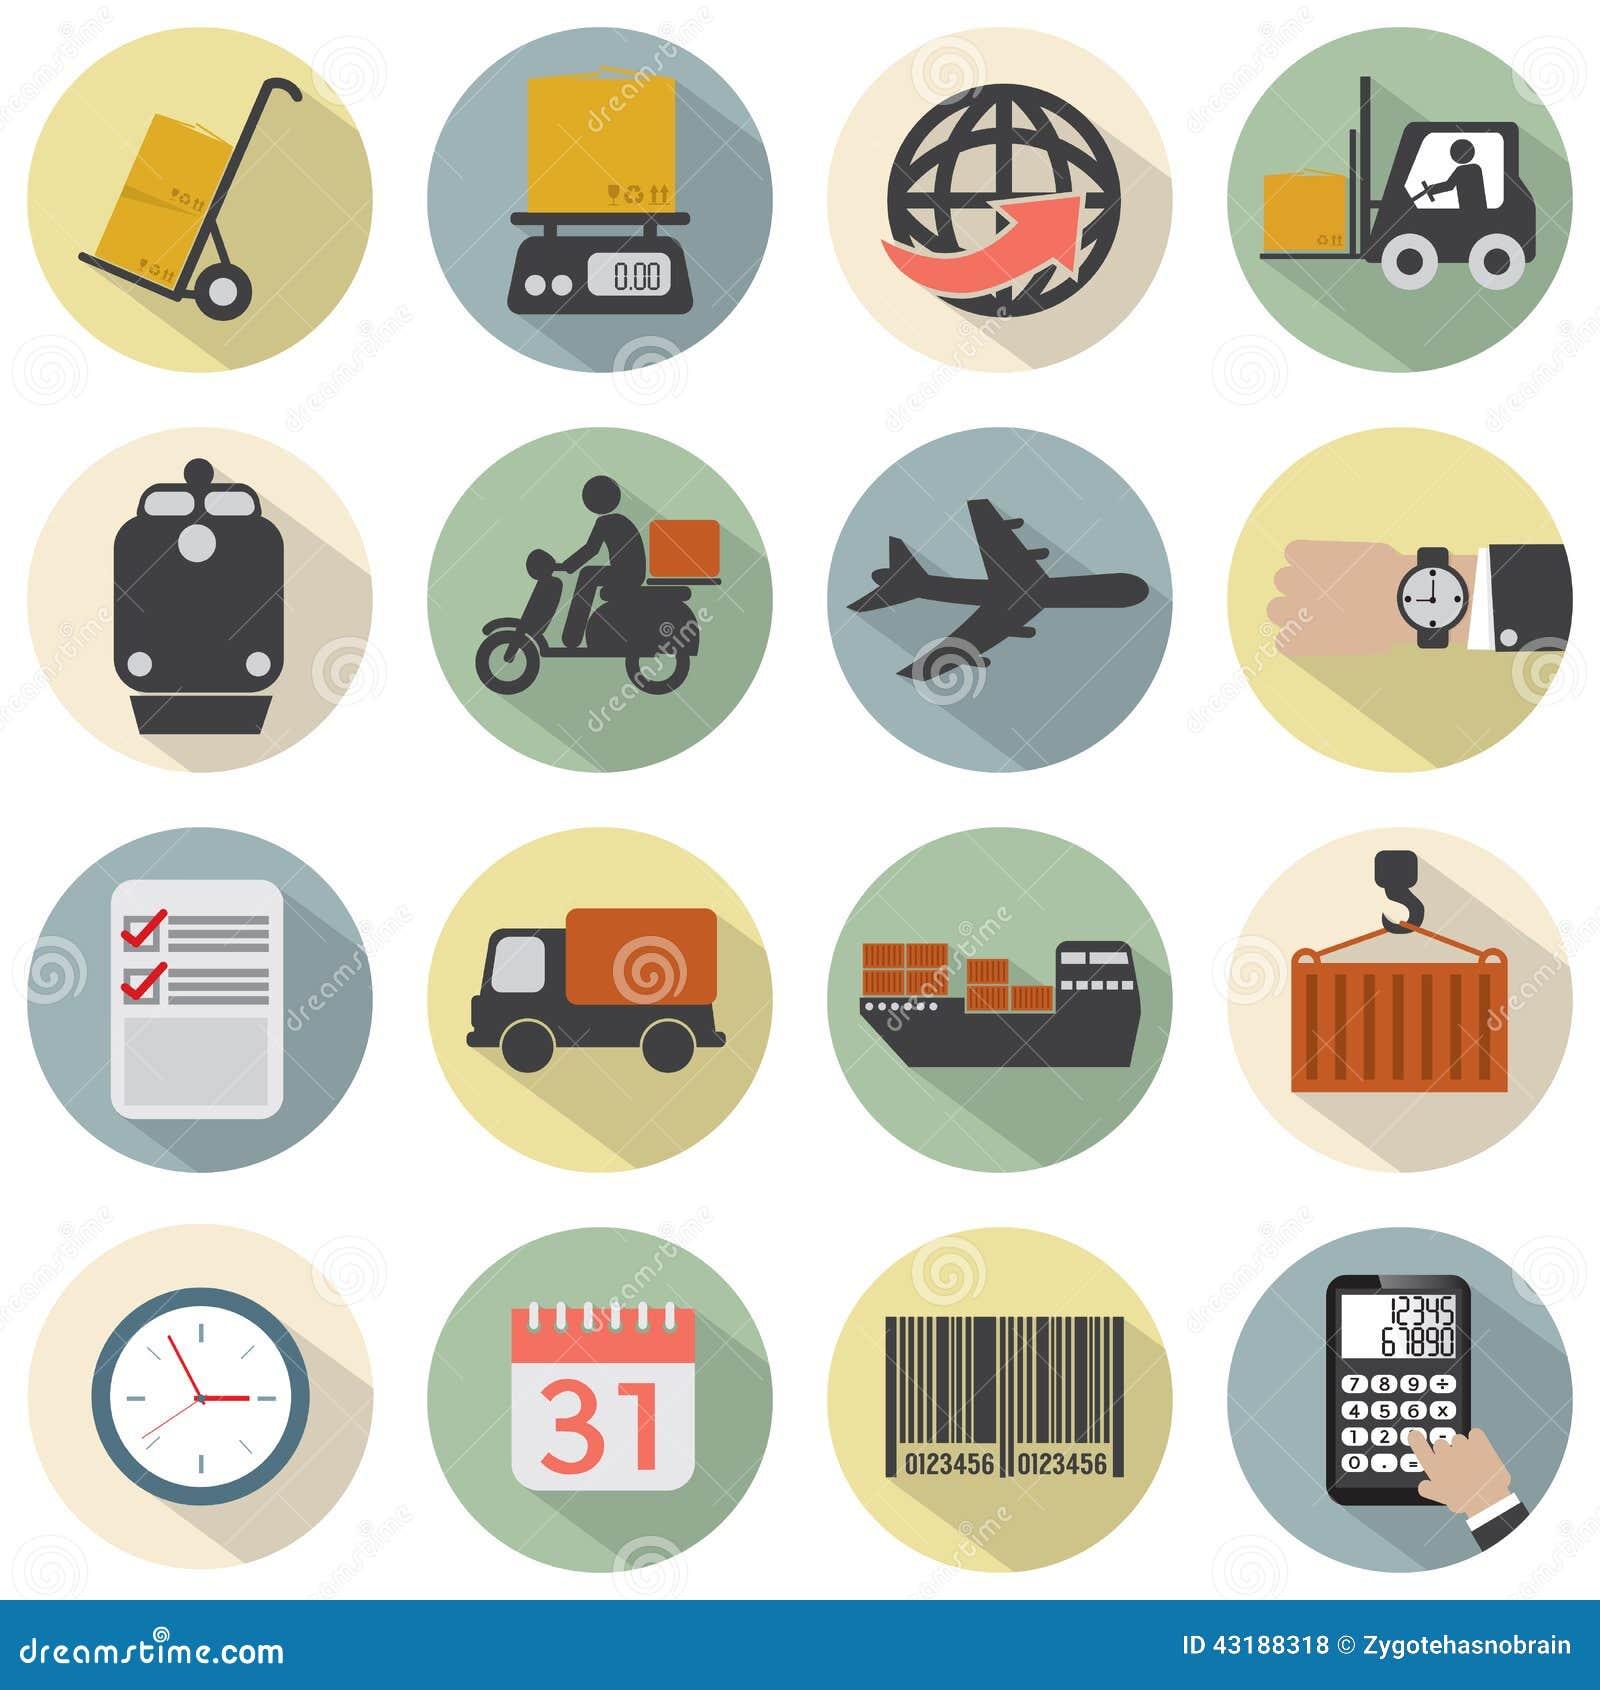 Logistics Calendar Design : Modern flat design logistics icon set stock vector image